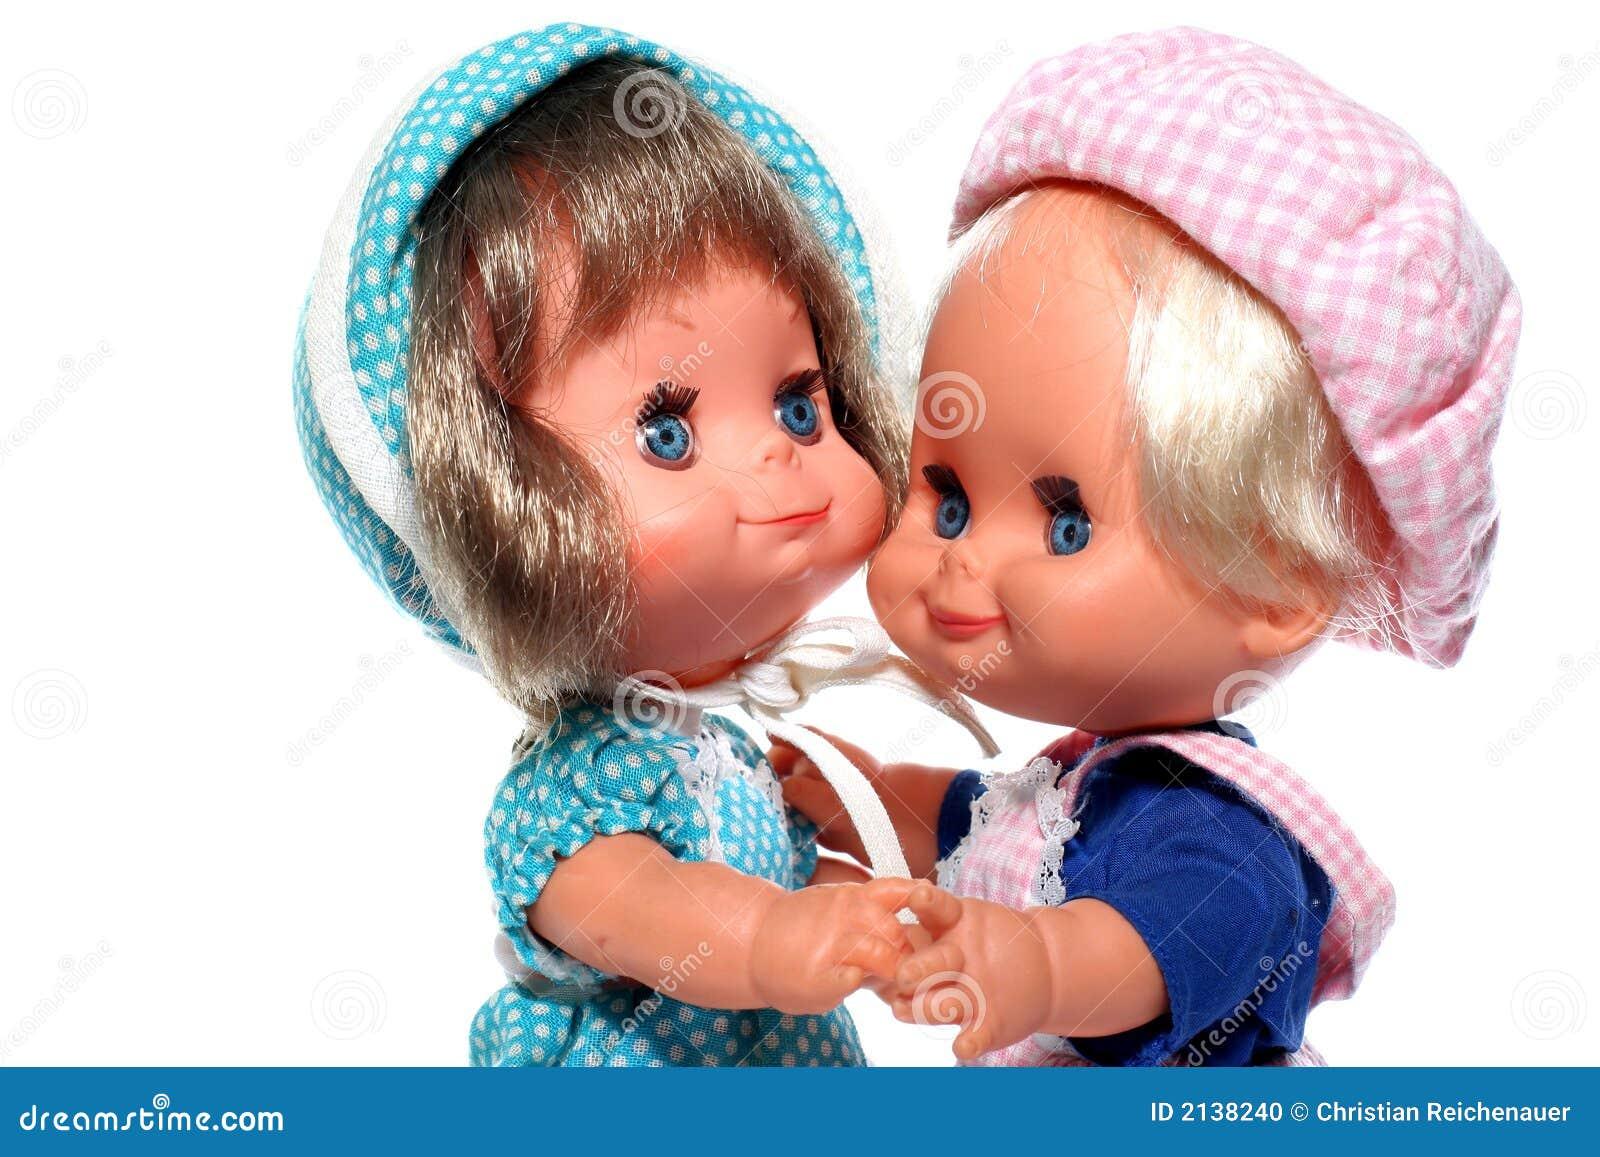 Download 2 happy dolls dancing stock photo. Image of greek, childhood - 2138240